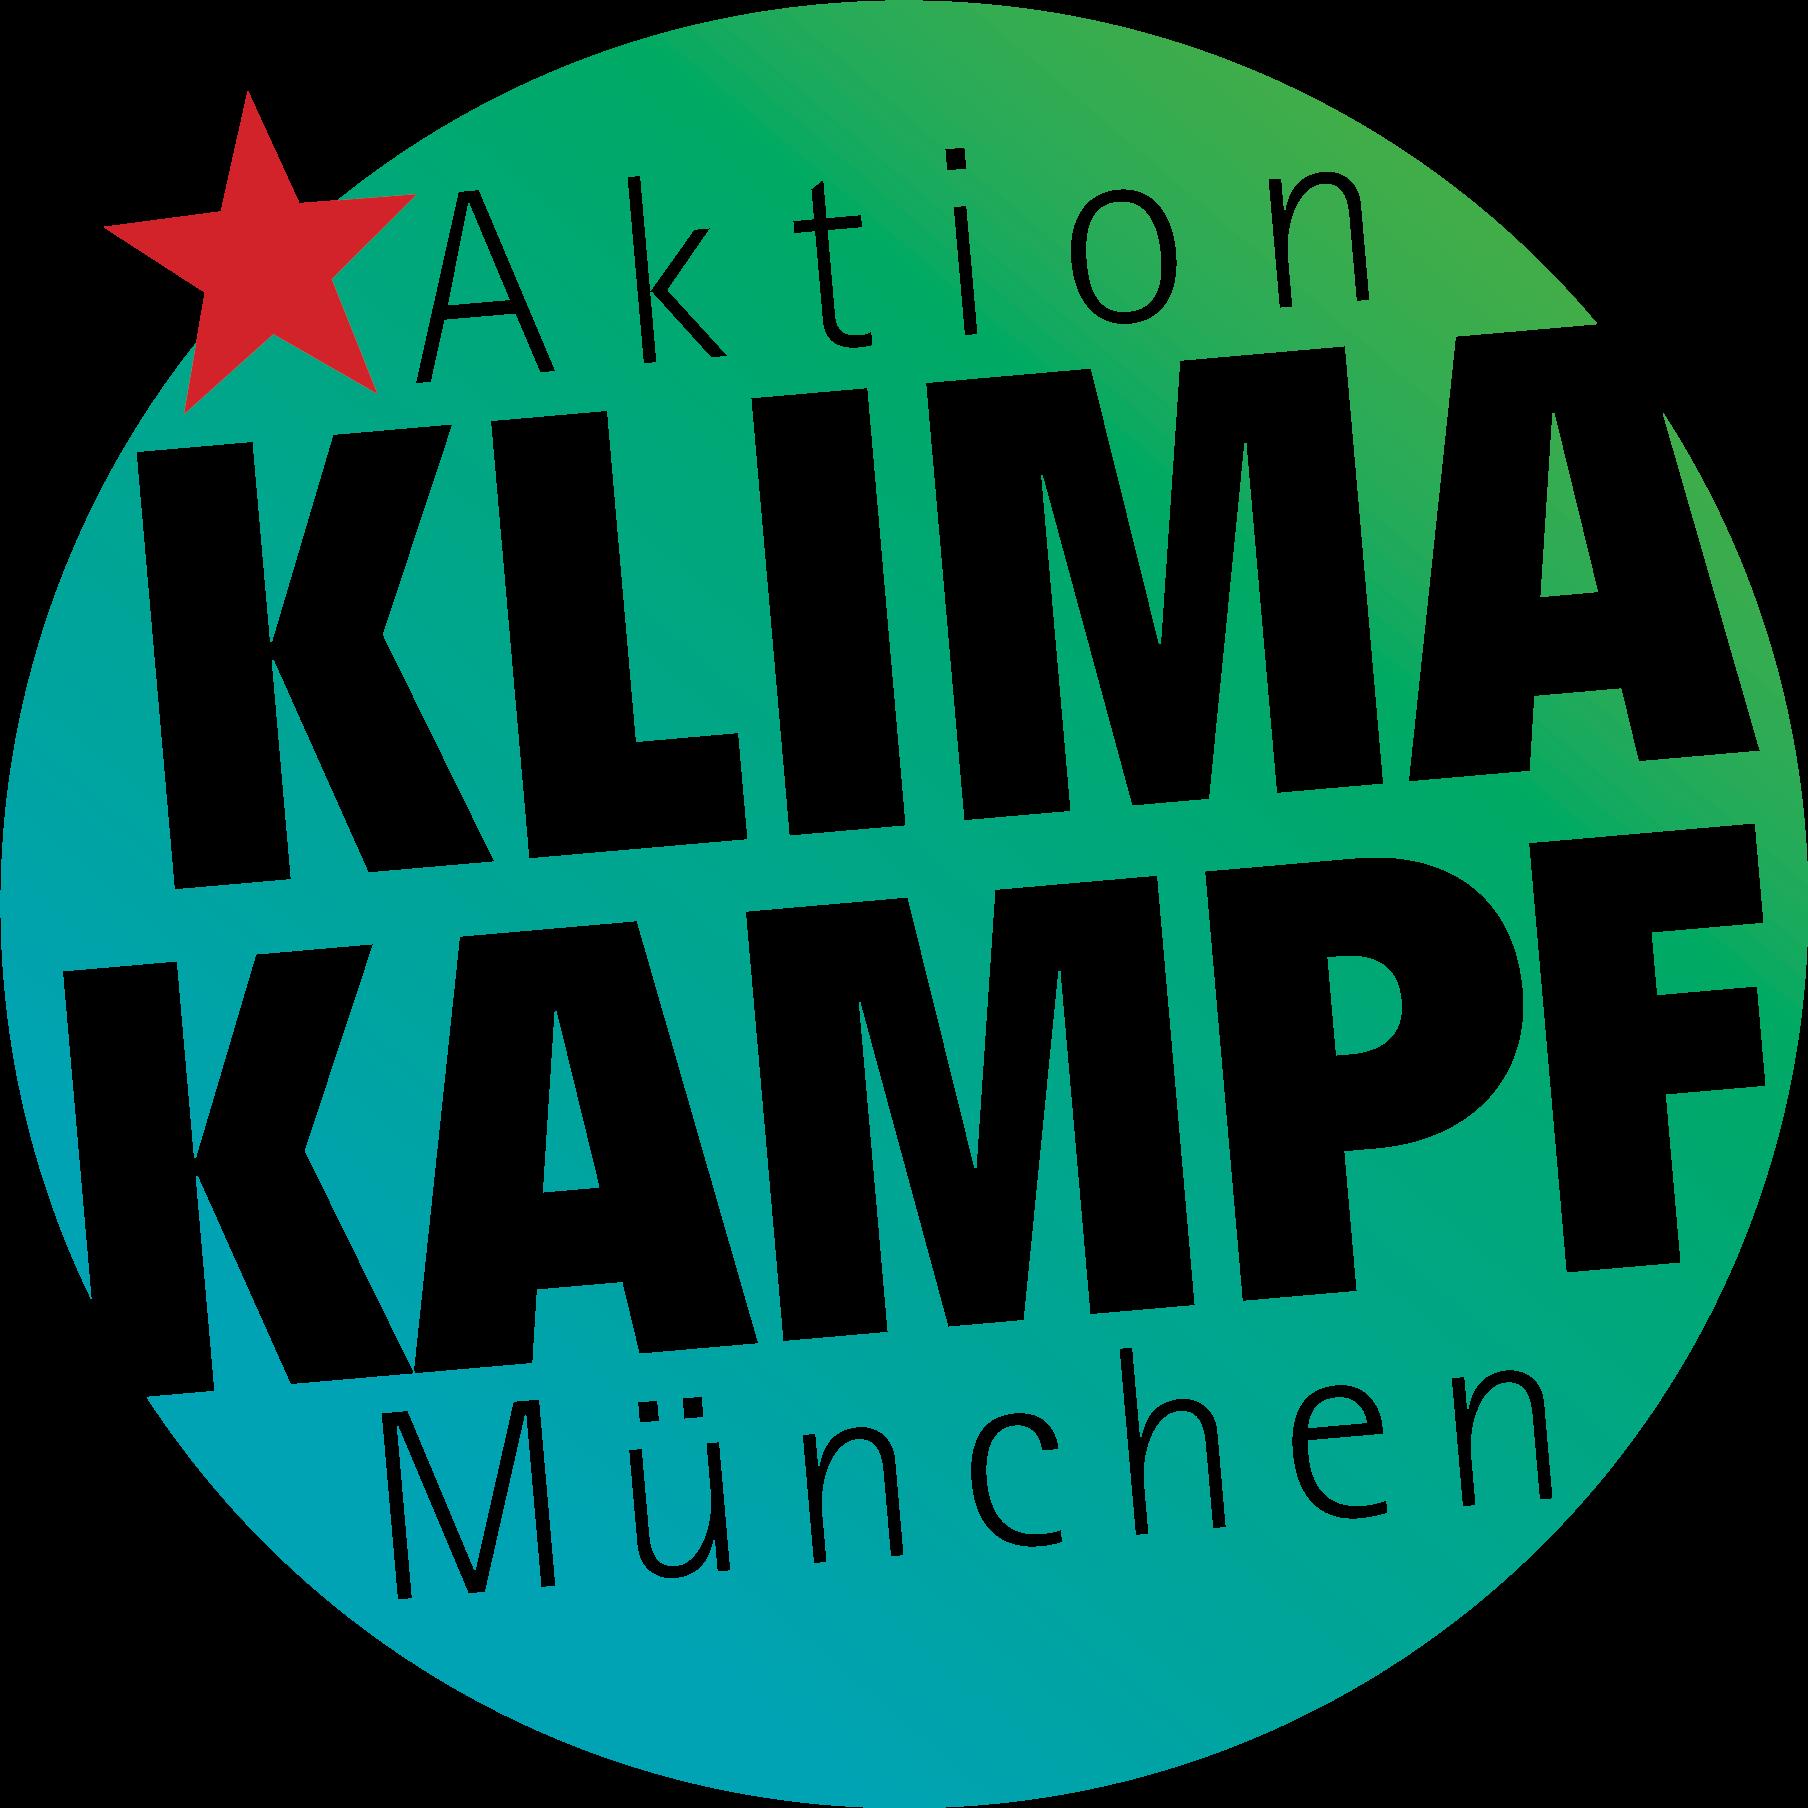 Aktion Klimakampf München